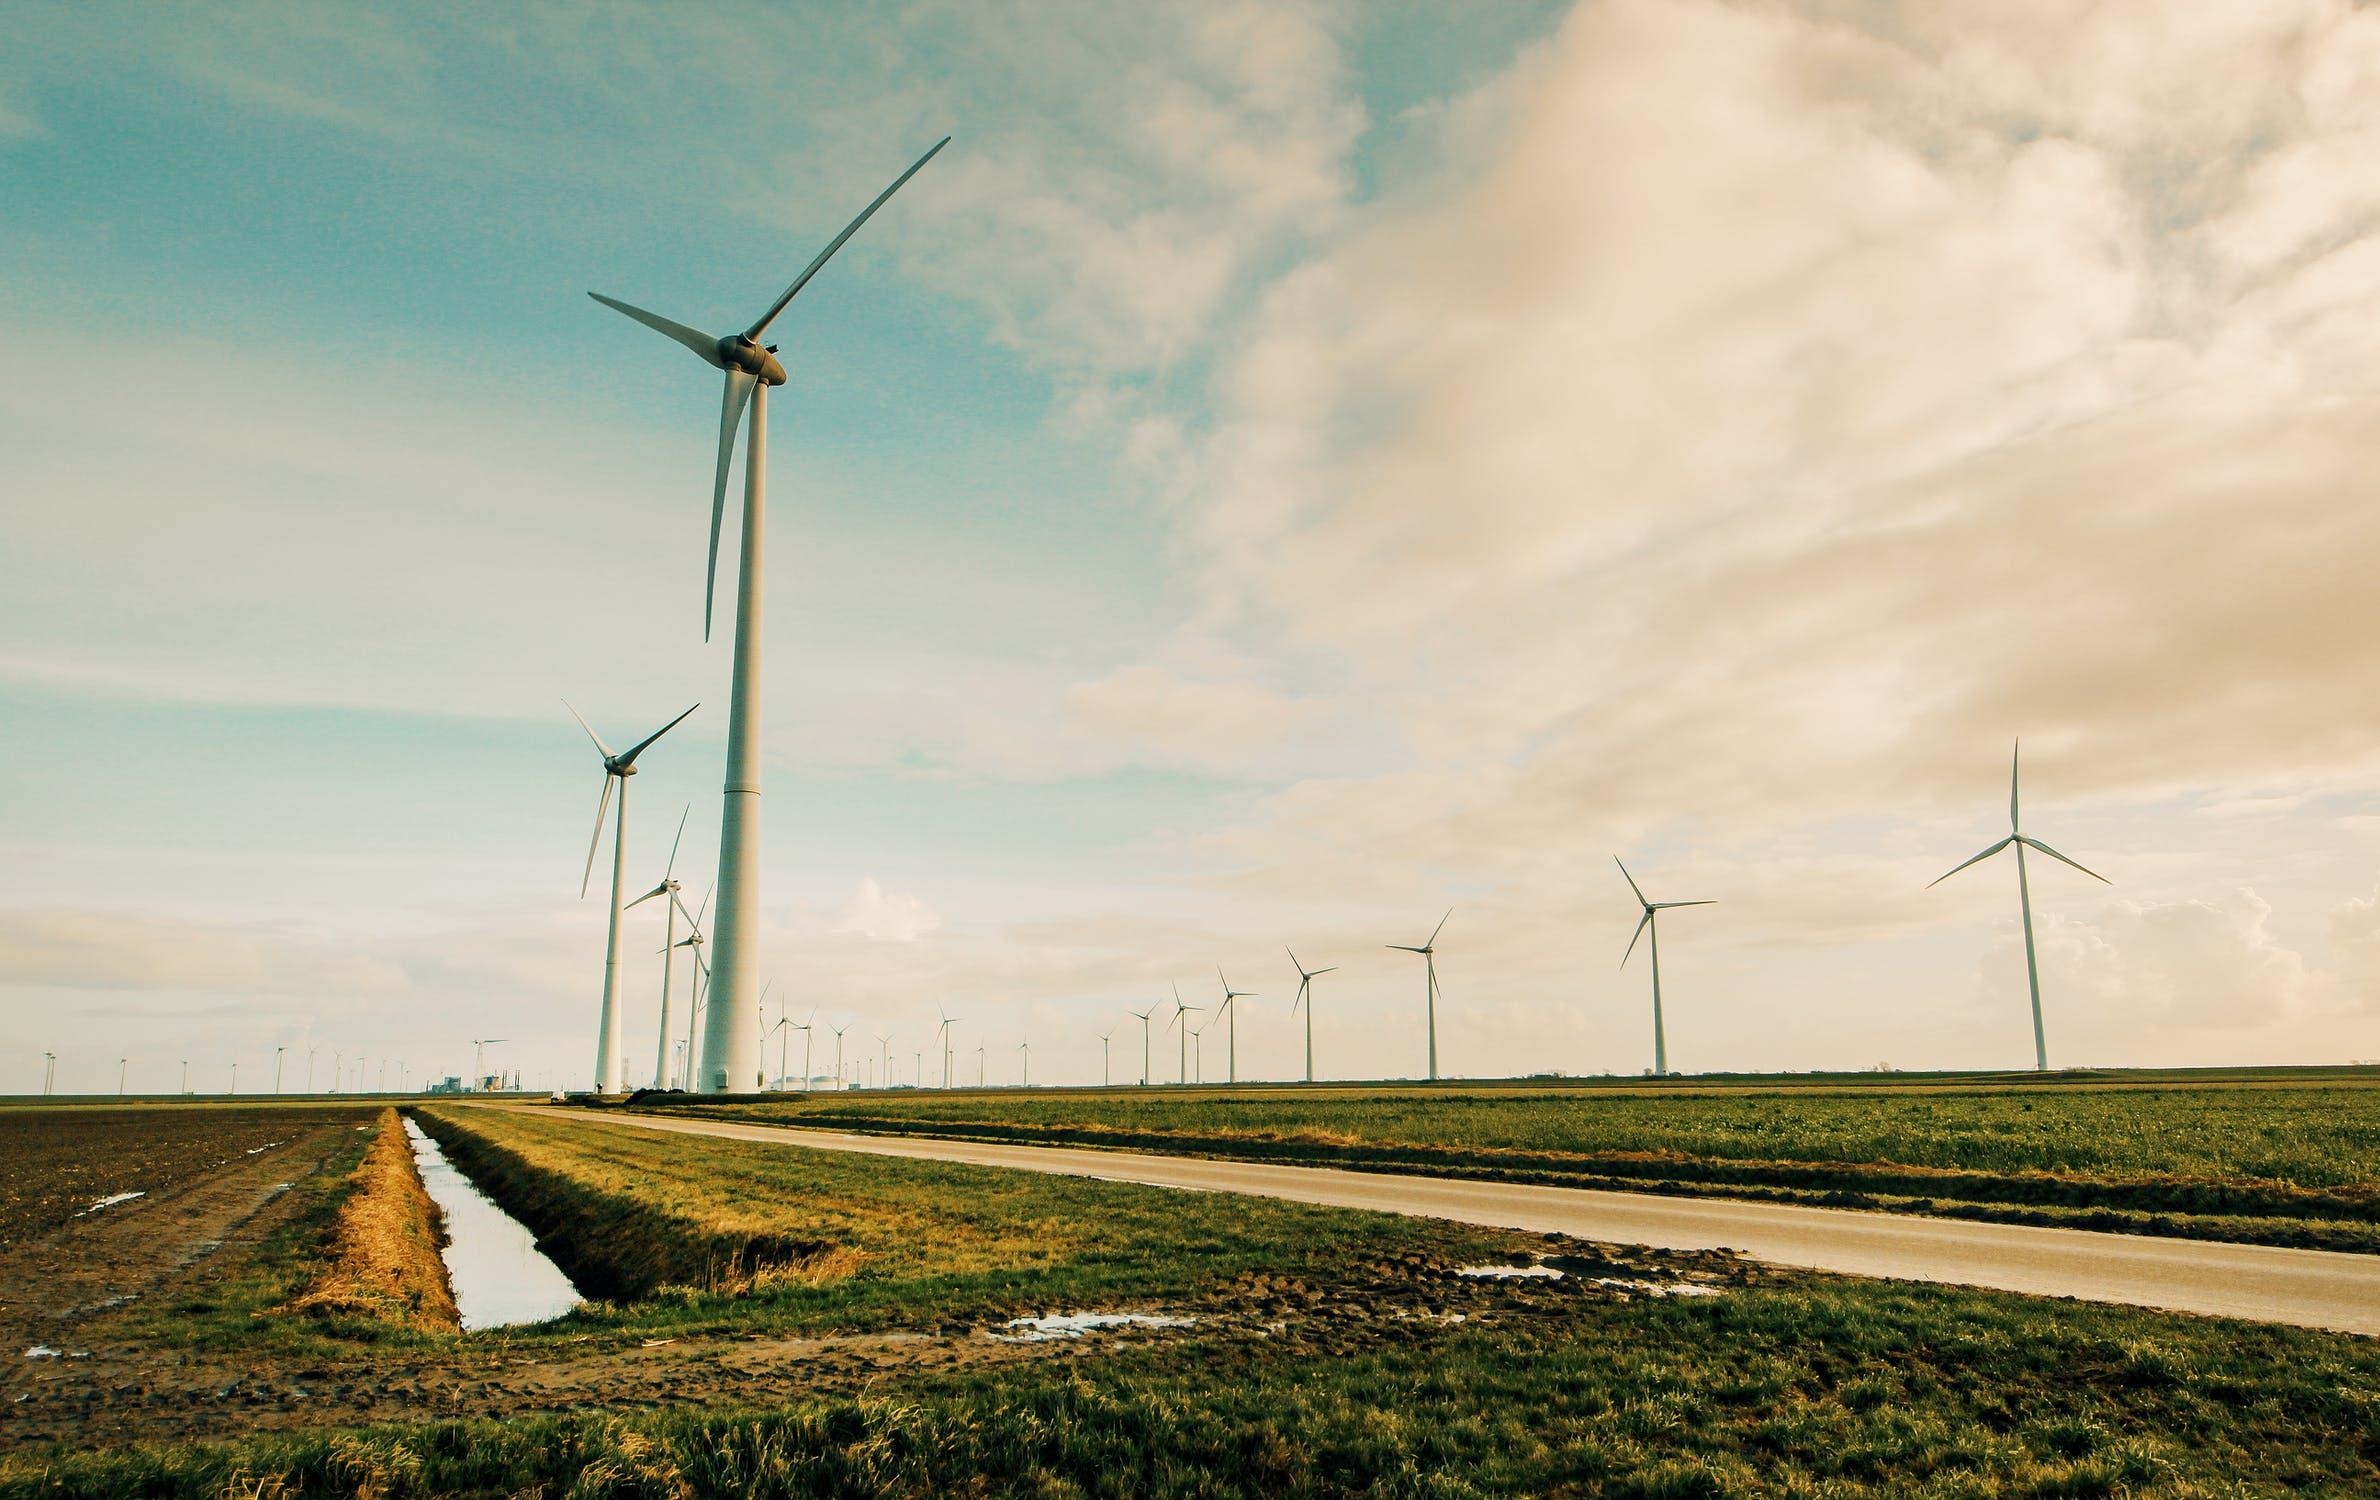 AleaSoft - Parque eolico renovables